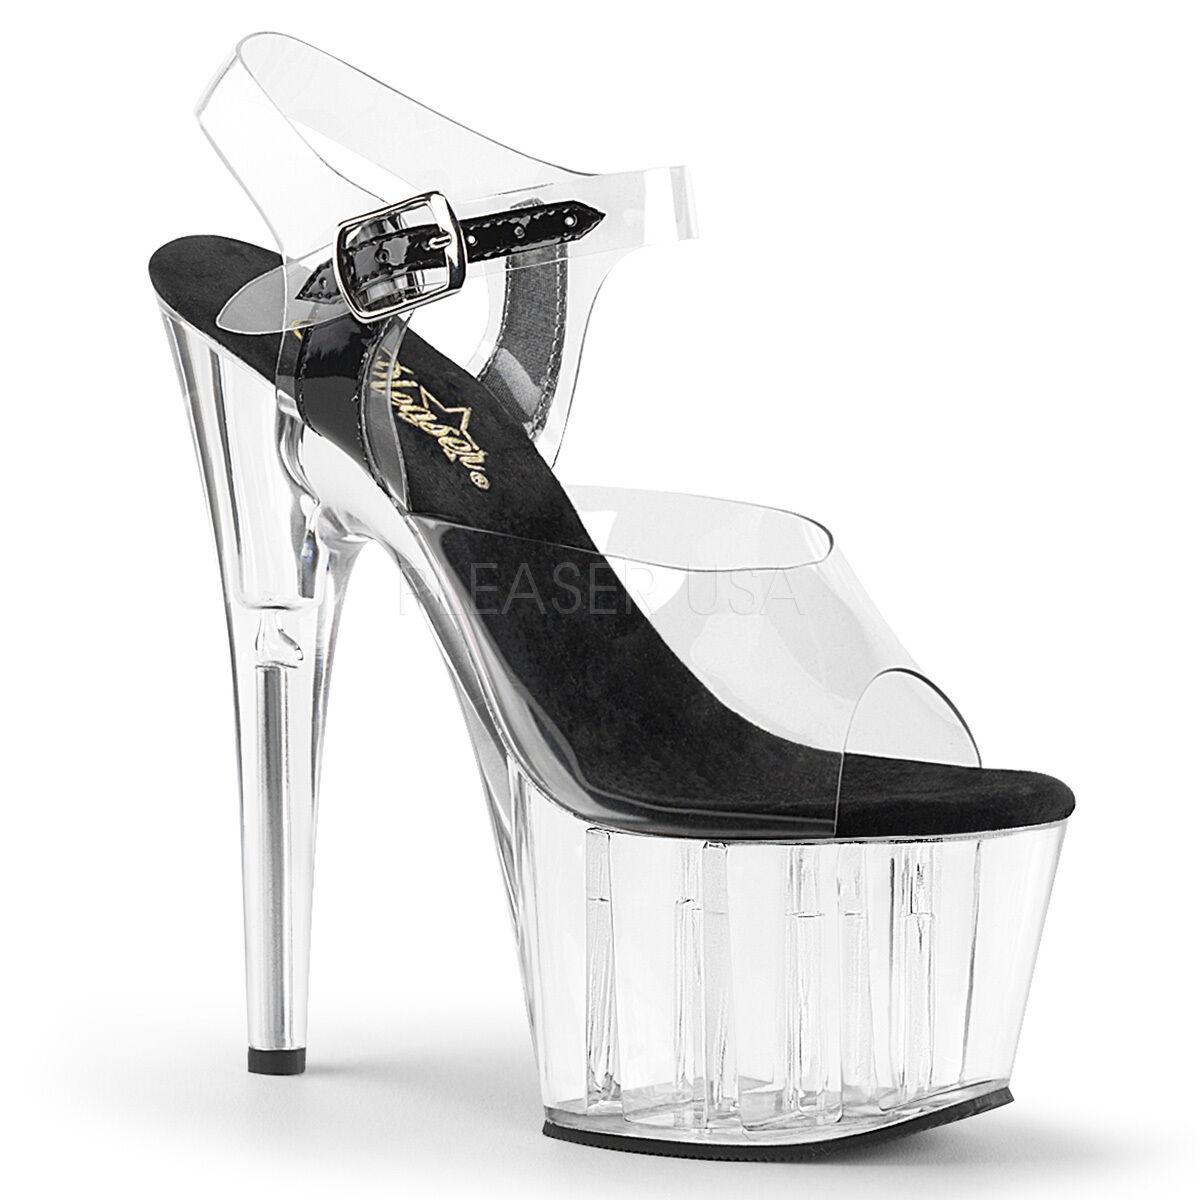 Pleaser Adore-708 Schuhes Platform Strap Sandales Stilettos High Heels Ankle Strap Platform Clear 096f7f